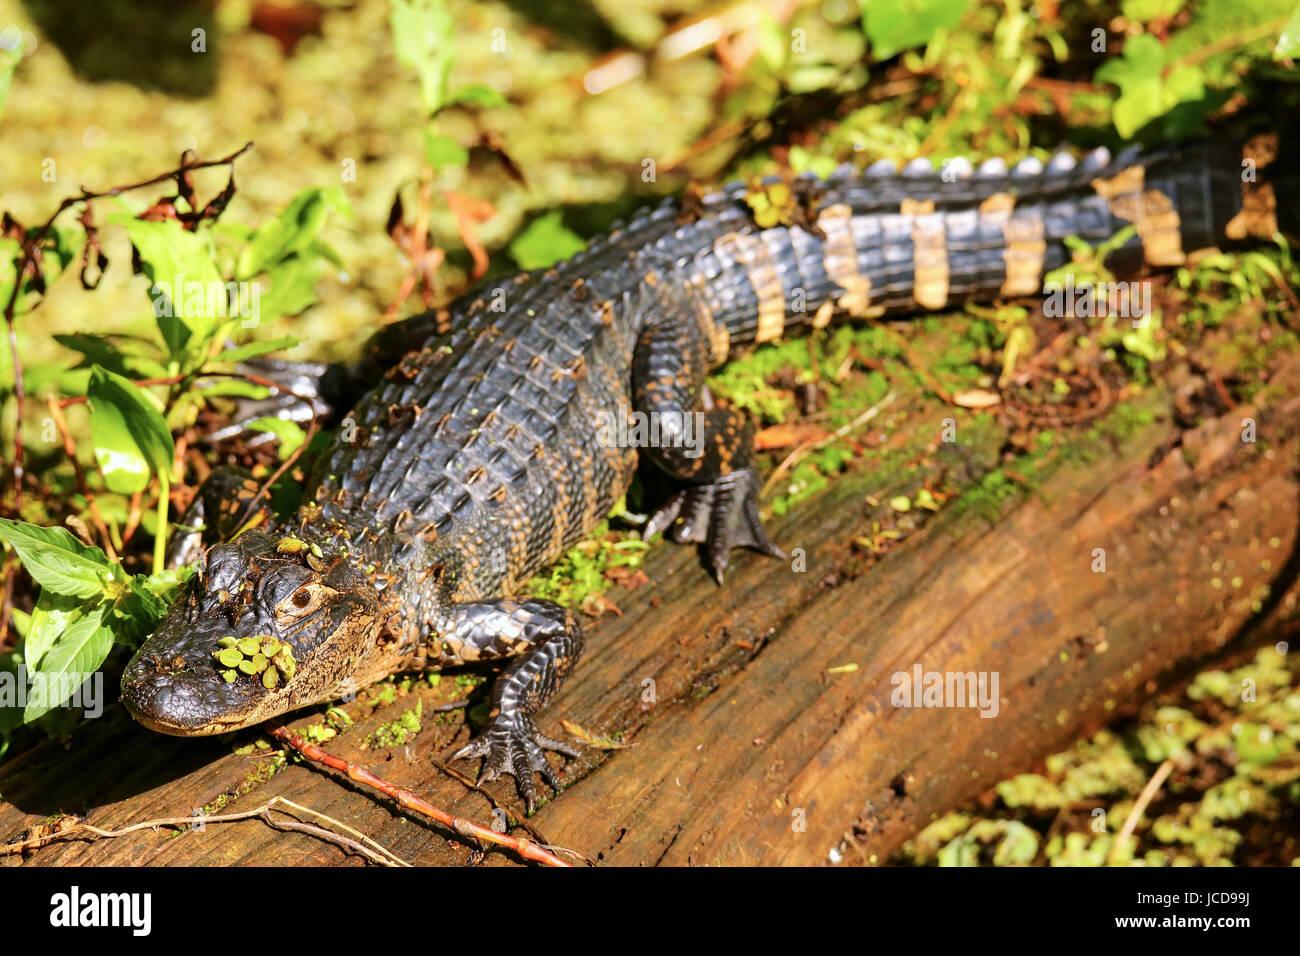 Alligator (Alligator mississippiensis) resting on a log Stock Photo